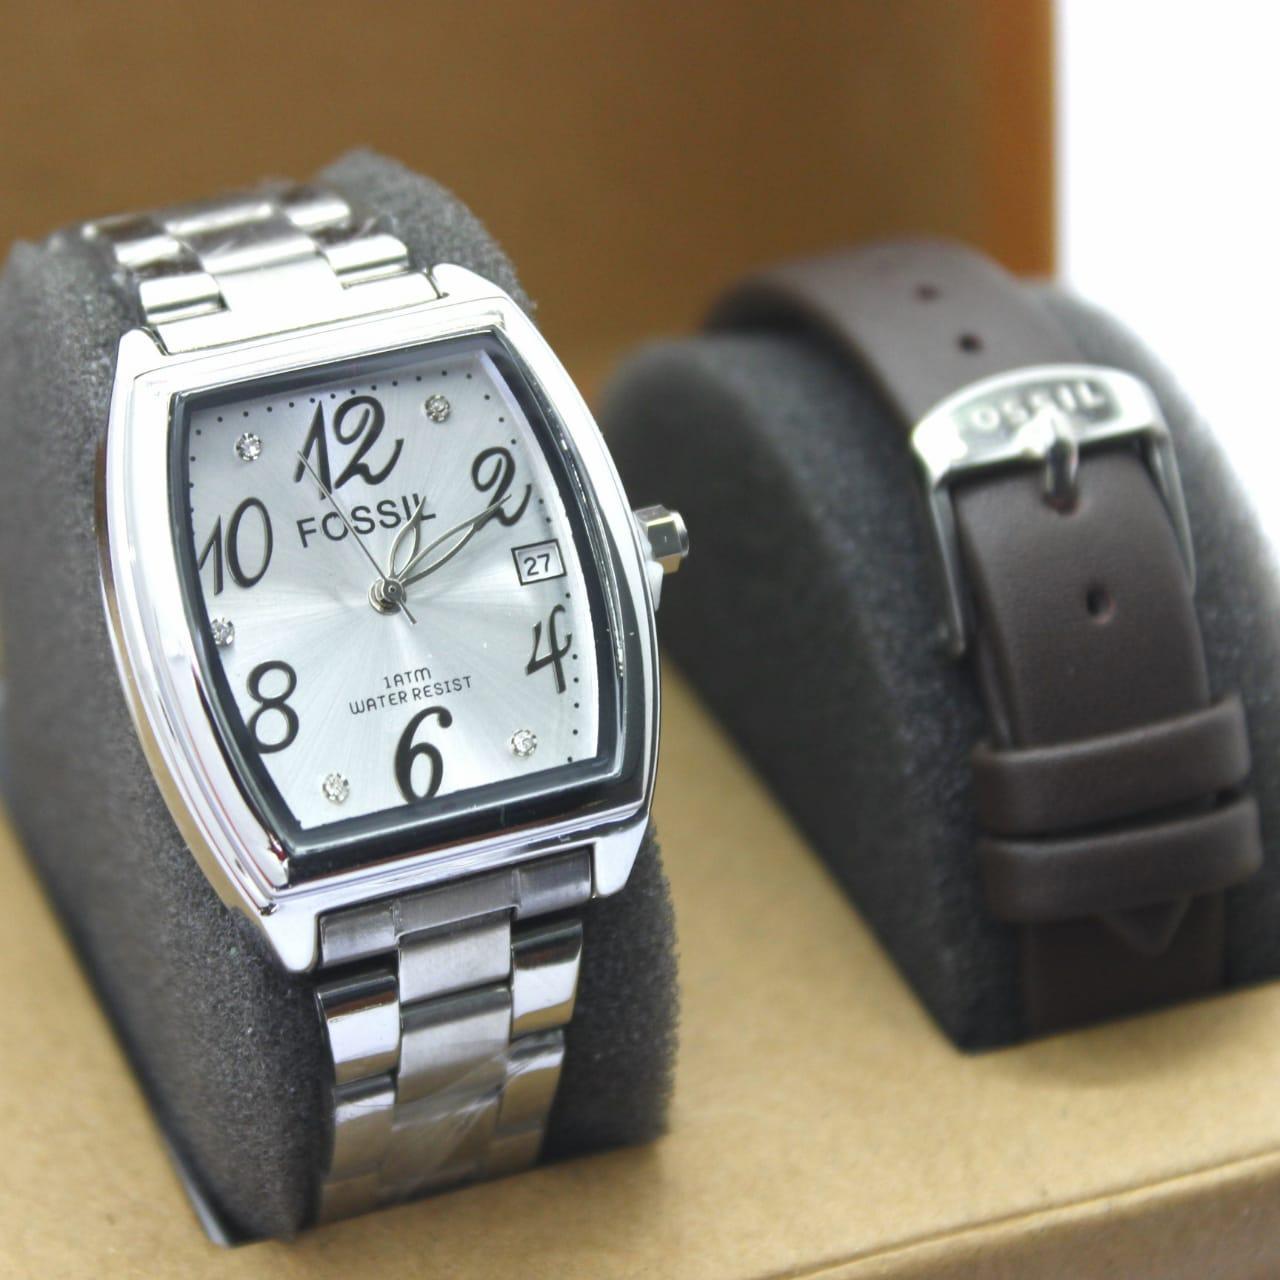 jam tangan fossil wanita tali rantai tanggal aktif FREE box dan tali kulit (COD)